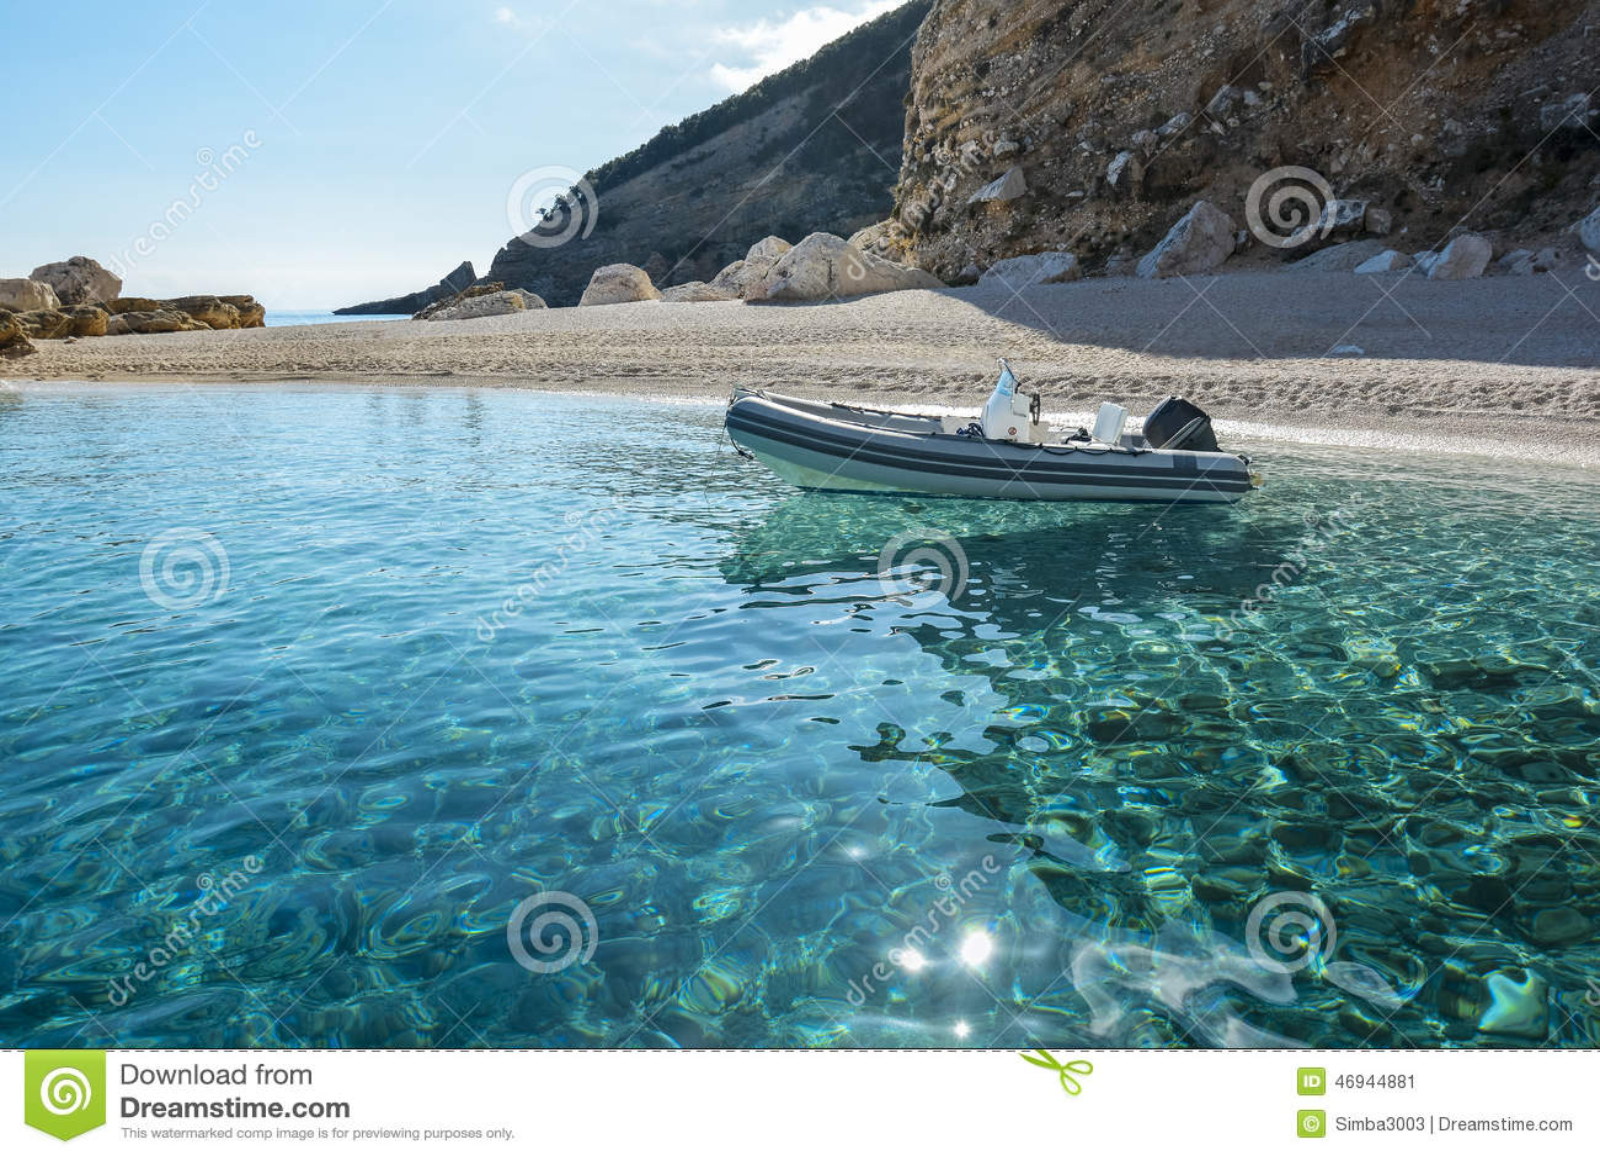 Orosei Italy  City new picture : ... rocks emerald water cala mariolu golfo di orosei italy 46944881